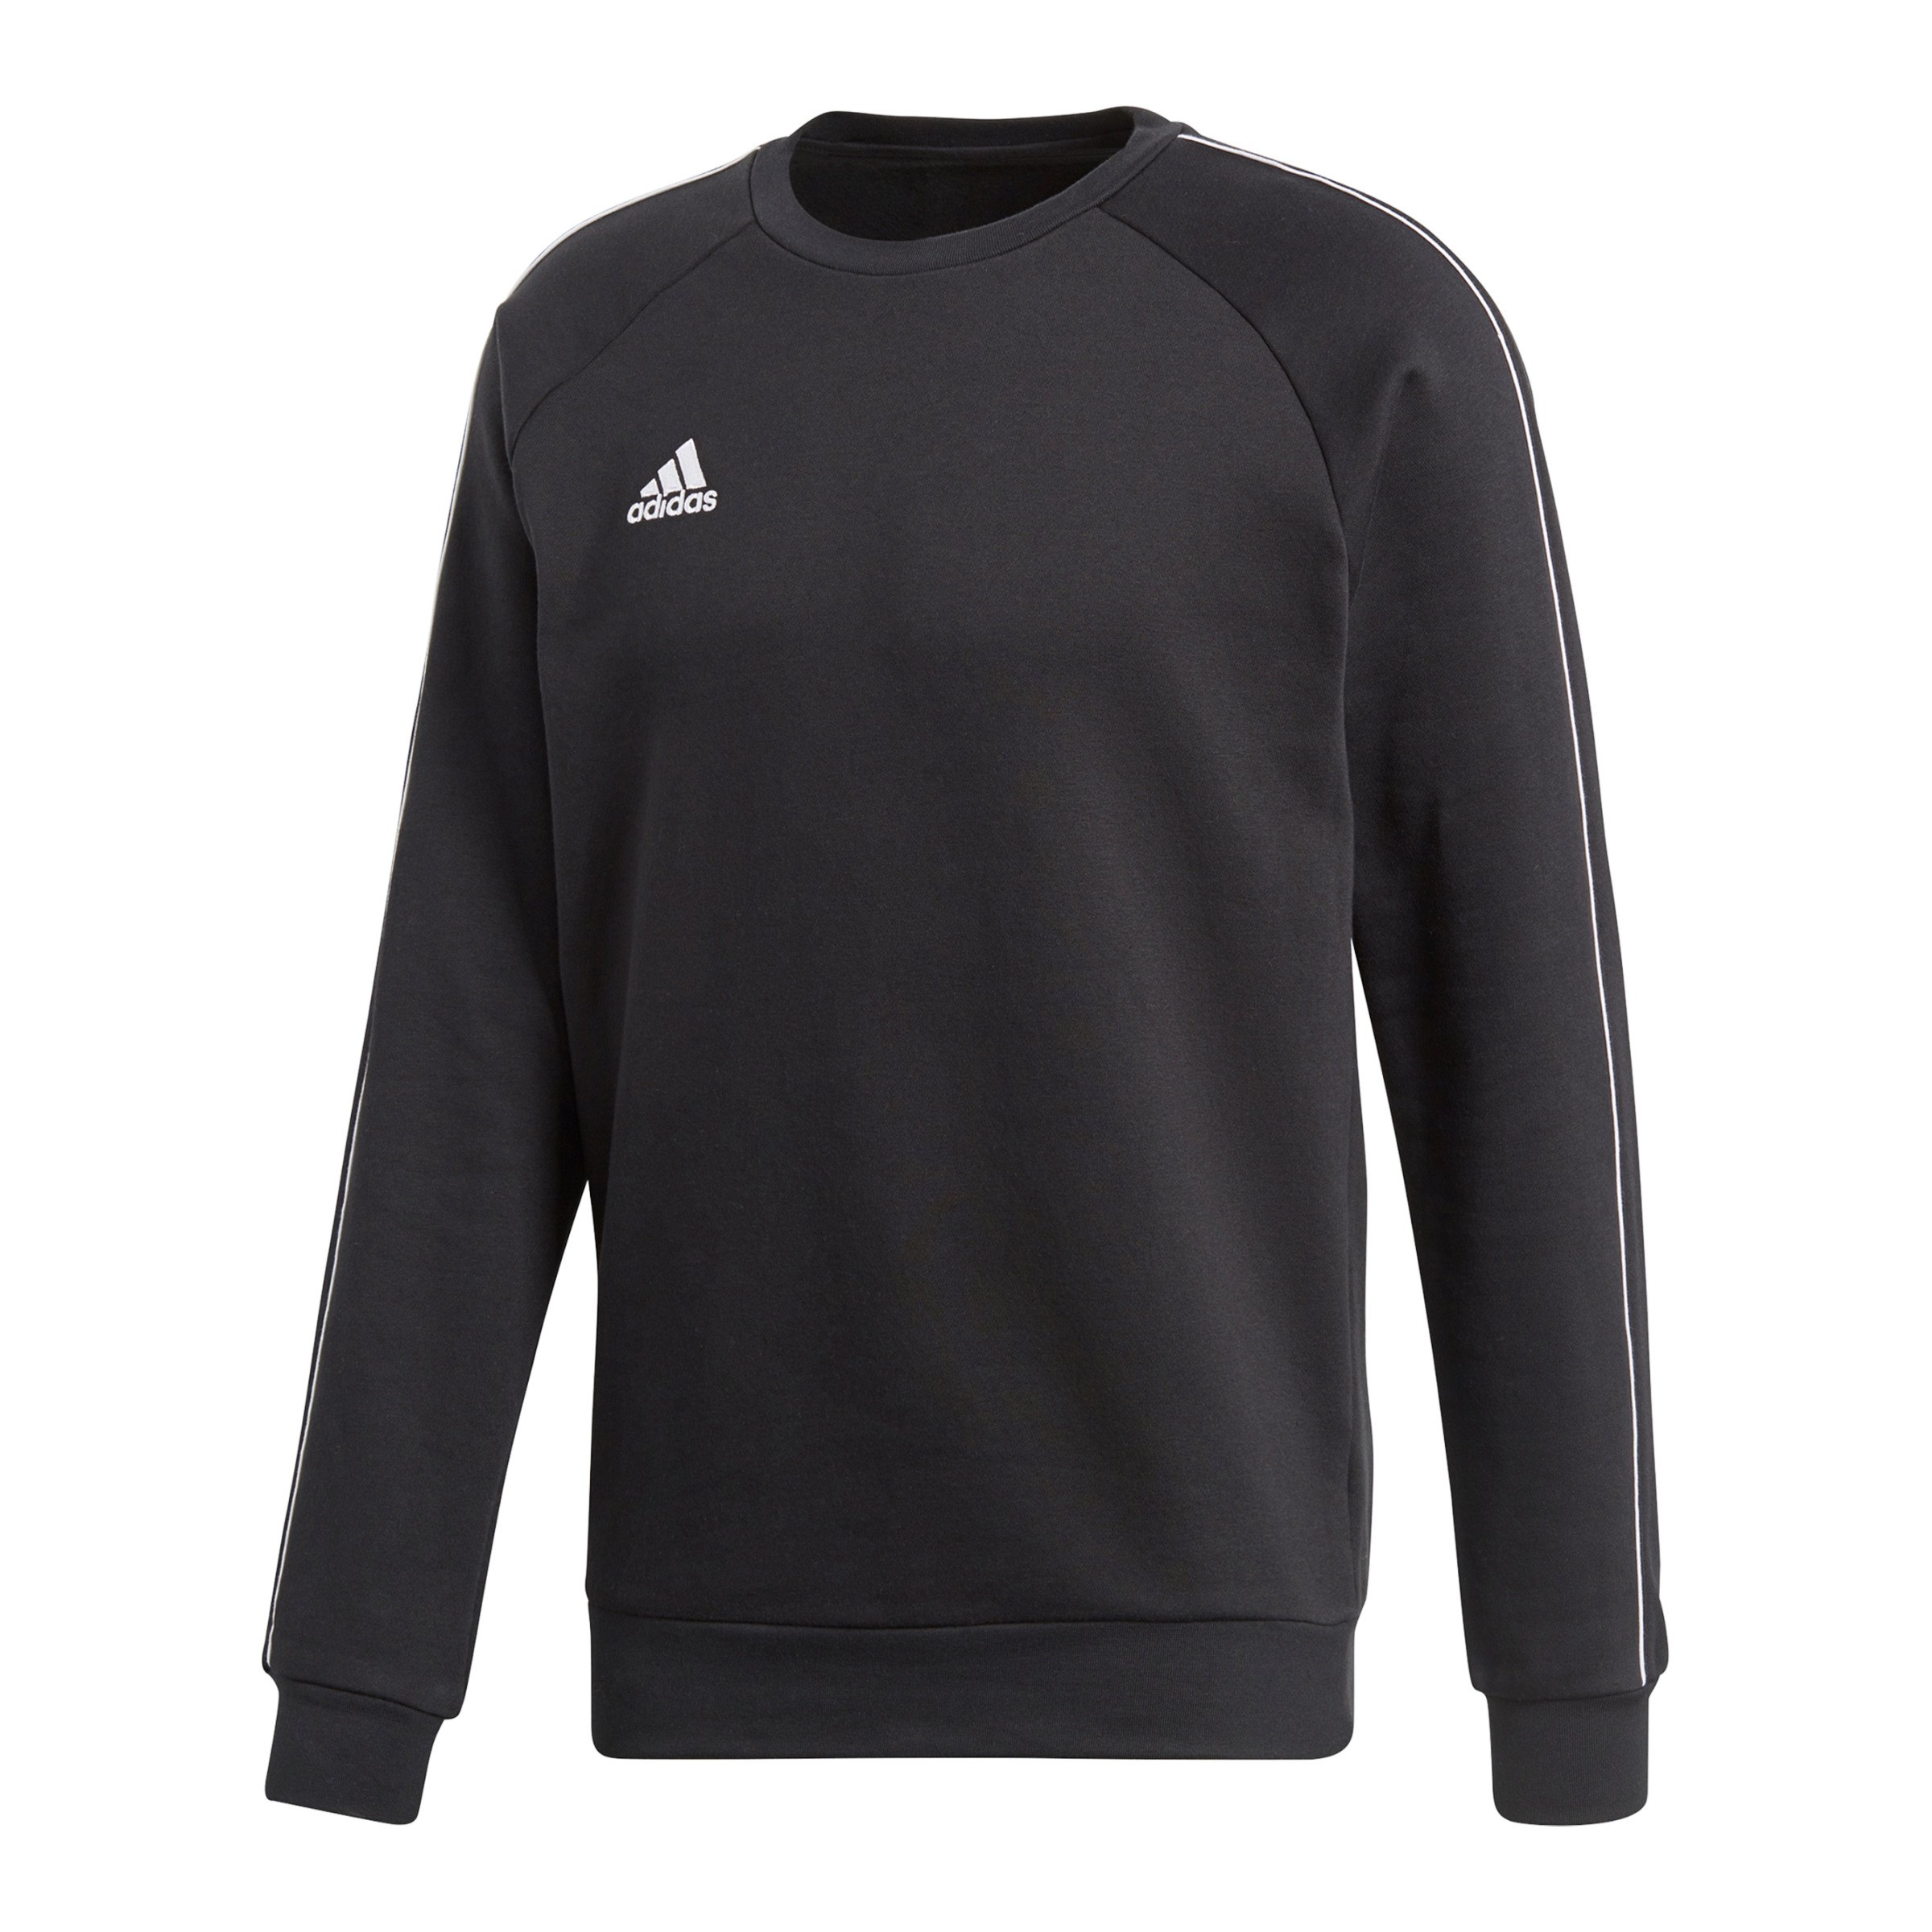 adidas Core 18 Sweat Top Schwarz Weiss   Teamsport   Teamwear ... c5c44e007e